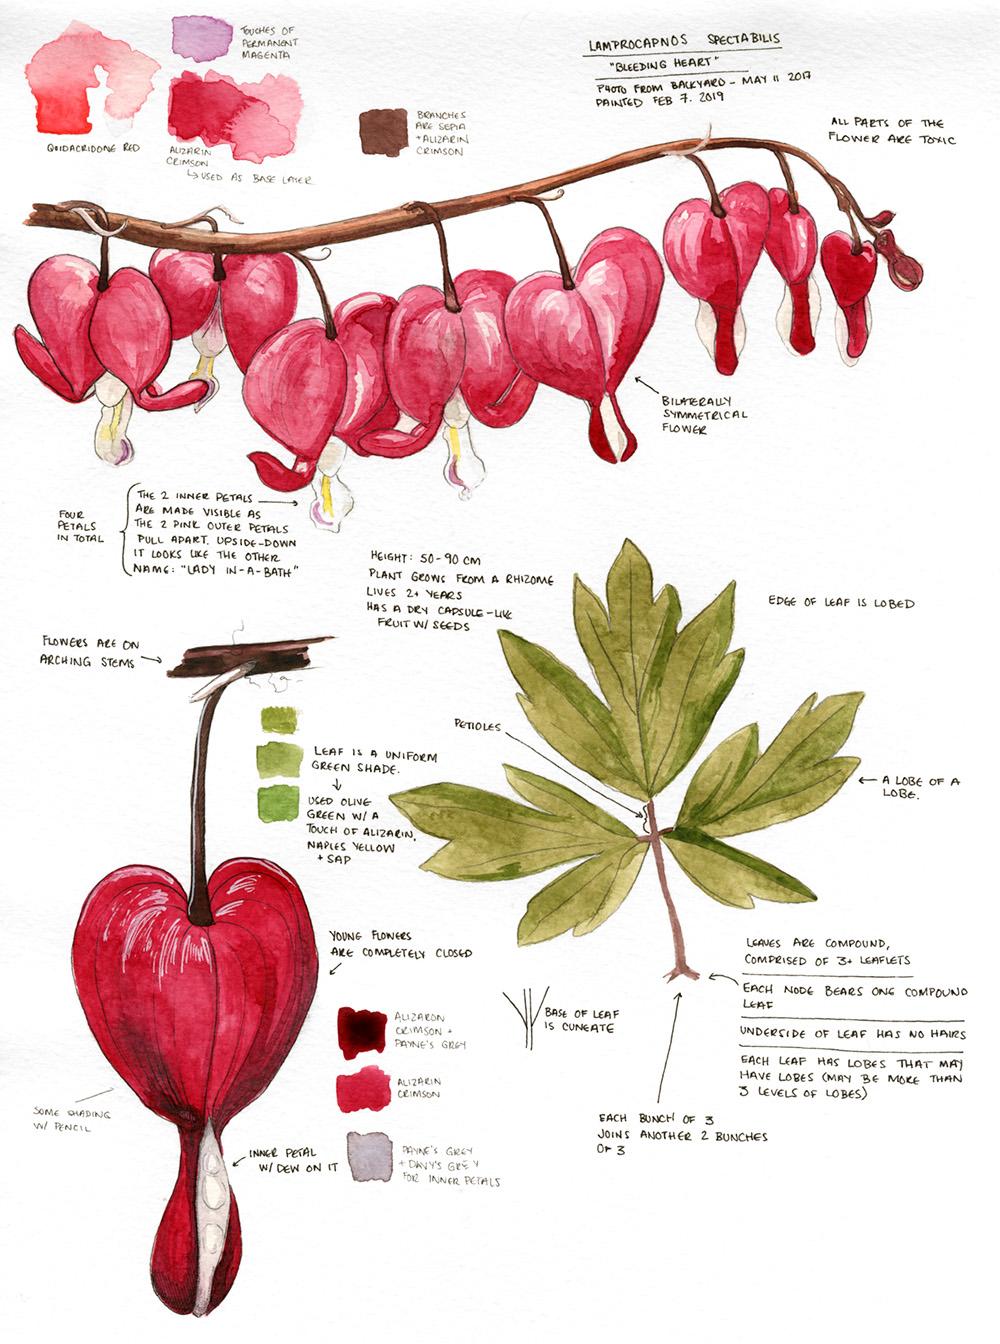 Bleeding Heart (Lamprocapnos Spectabilis) from our backyard